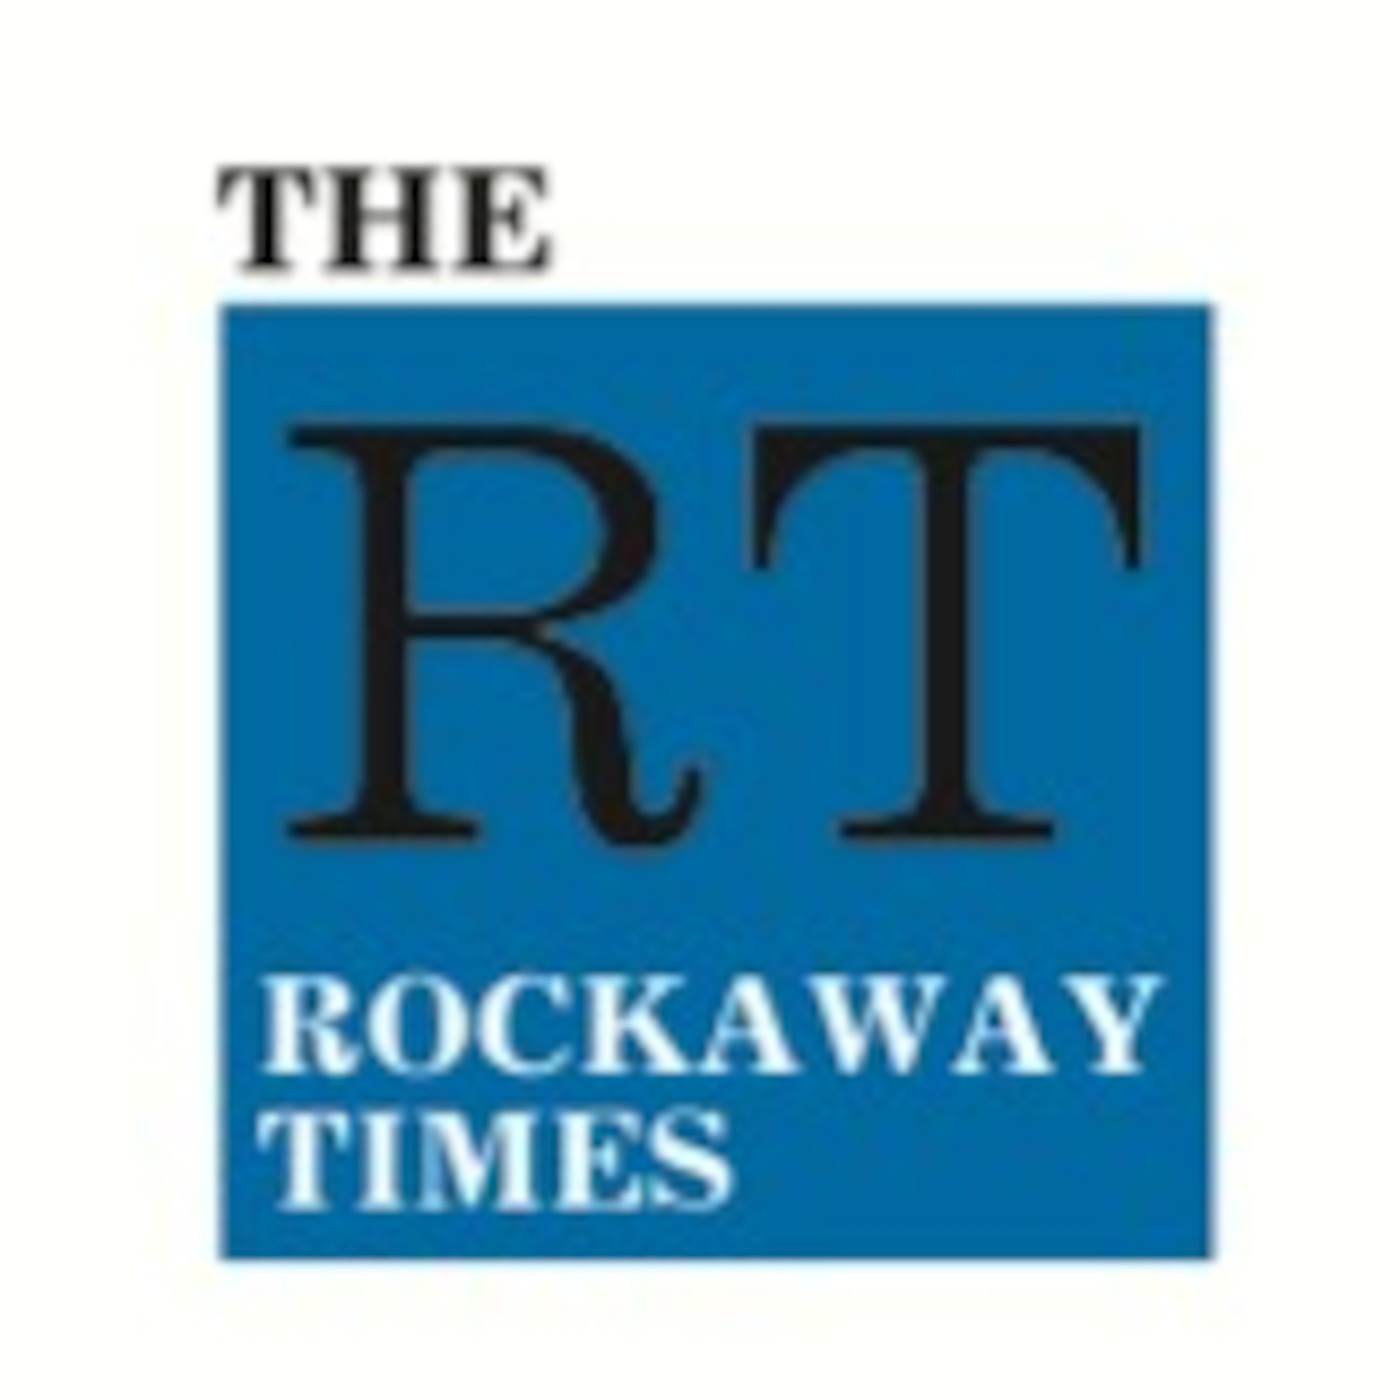 RockawayTimes